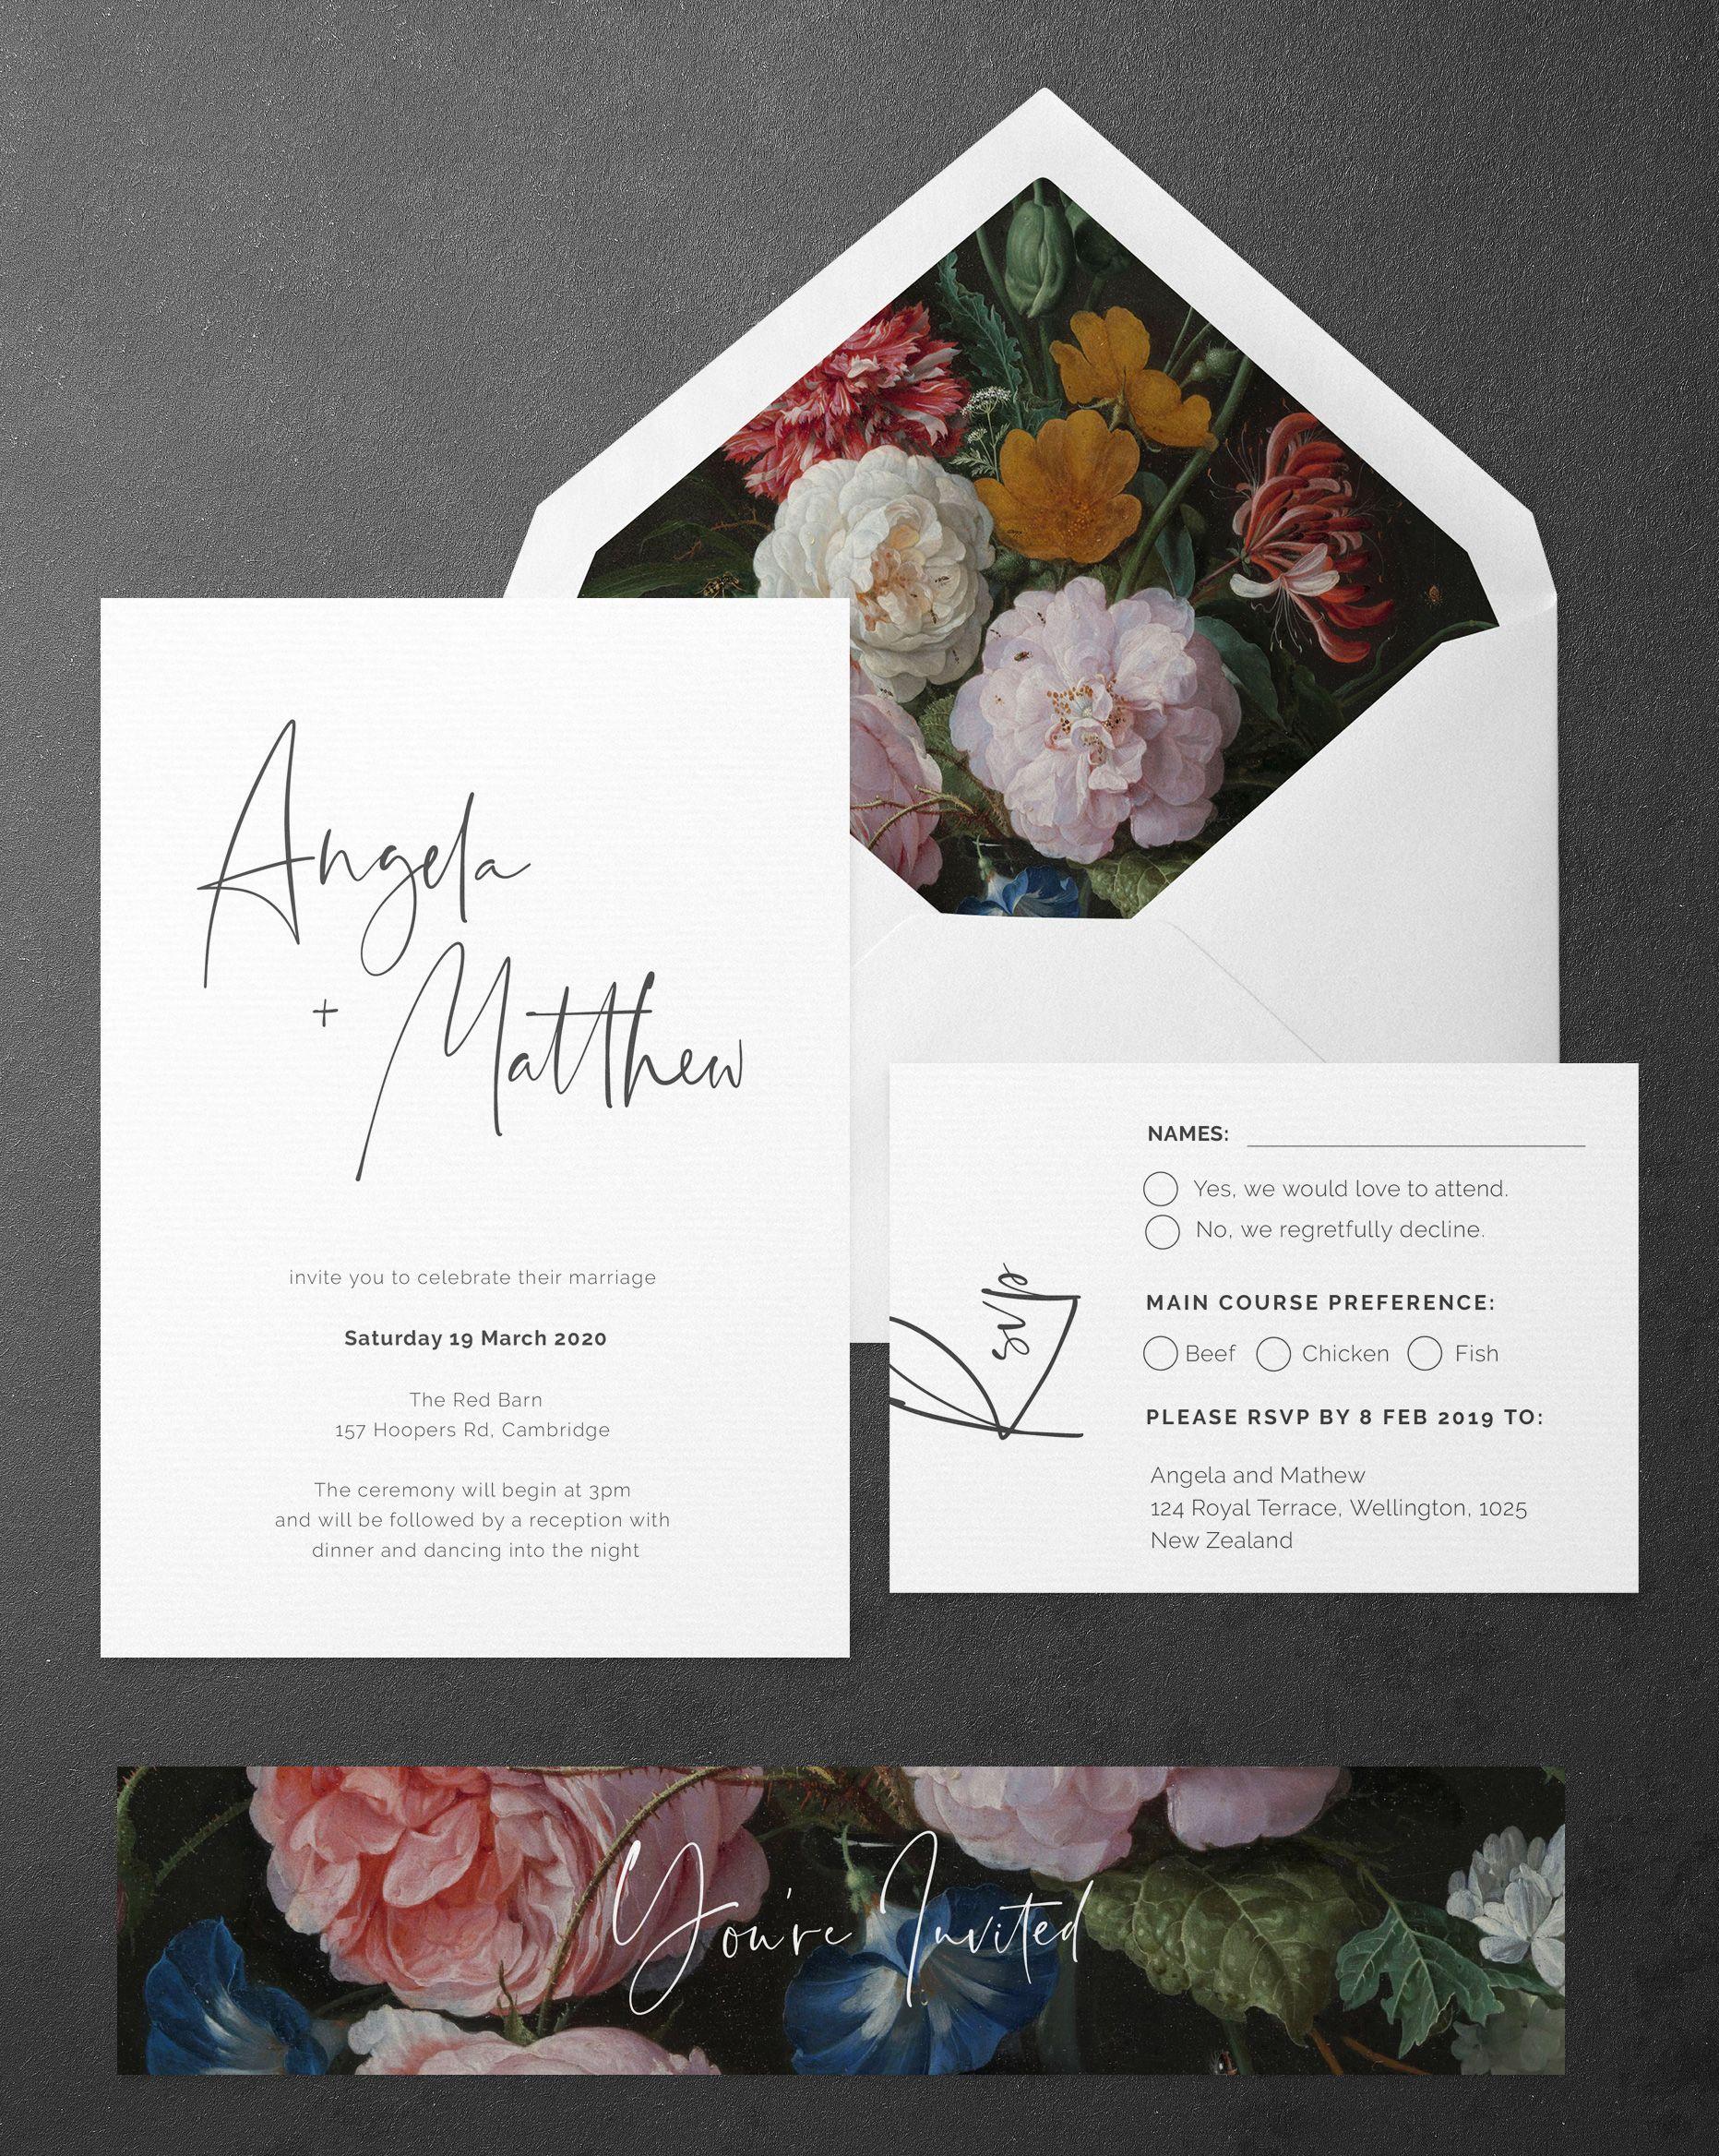 Signature Wedding Invitations And Stationery Wedding Invitations Minimal Wedding Invitation Wedding Invitations Stationery